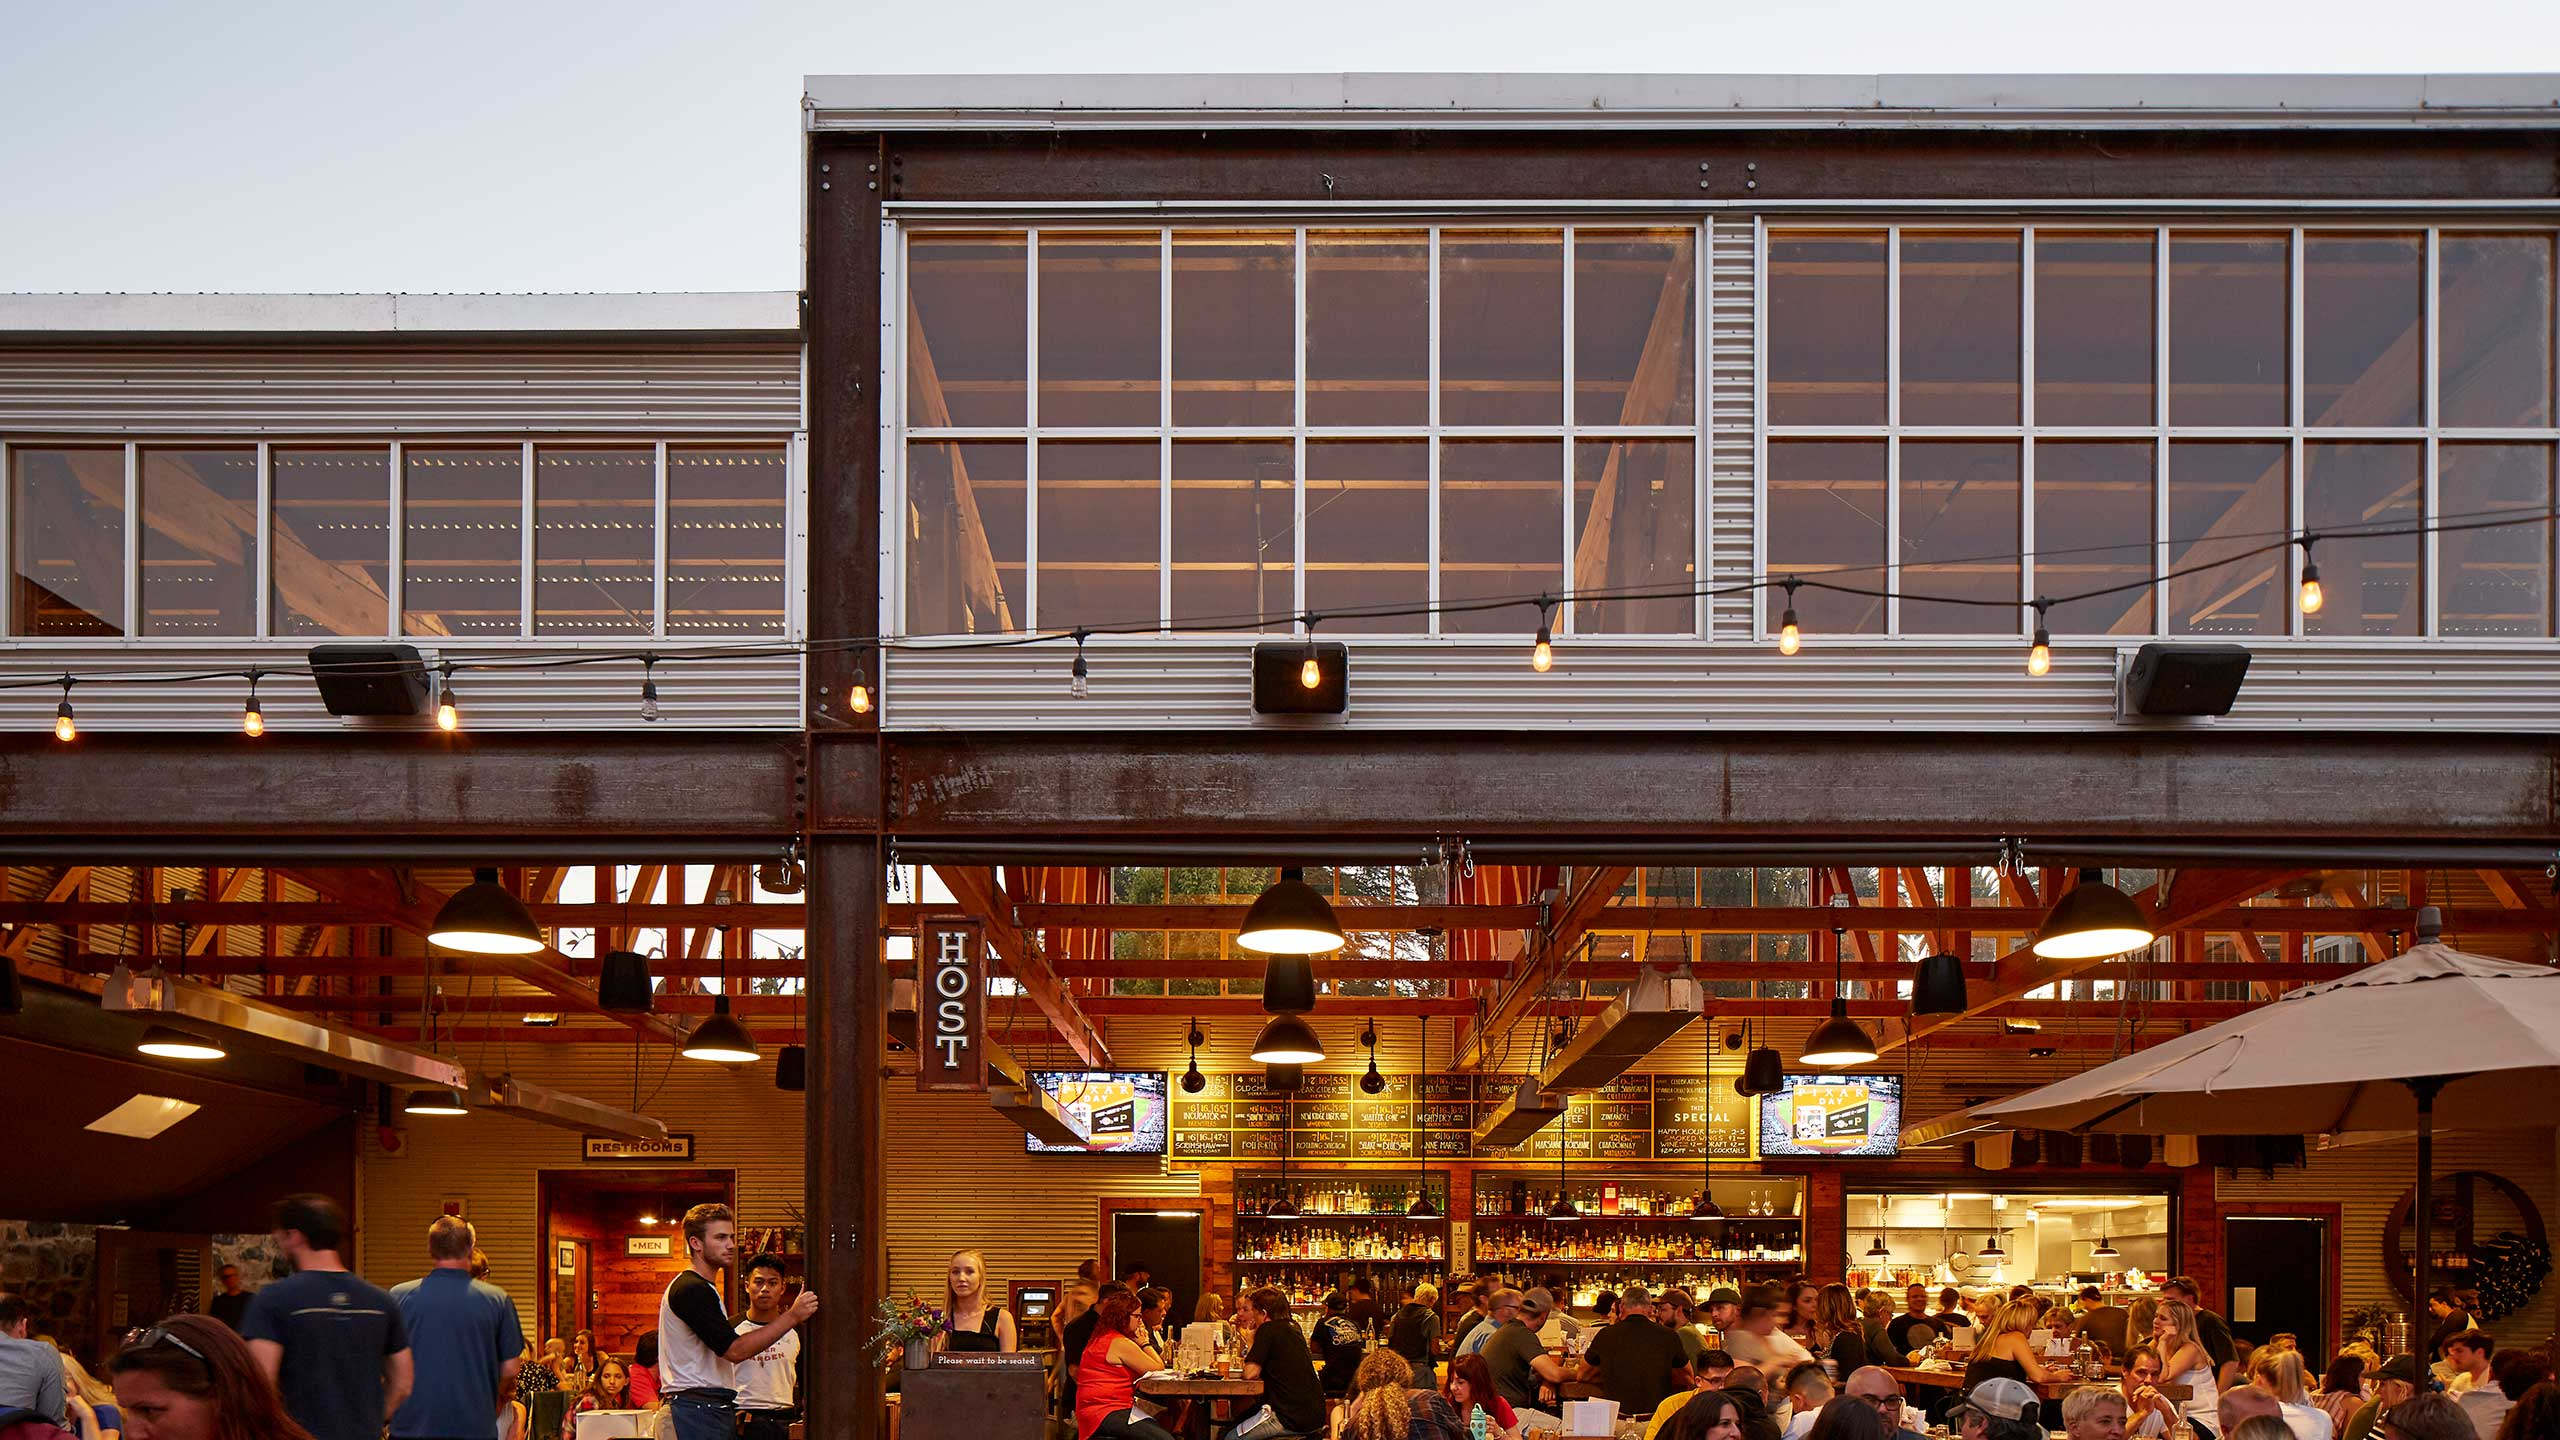 Petaluma-Restaurant-Design-Brewsters-open-air-style-Main-Restaurant-Building